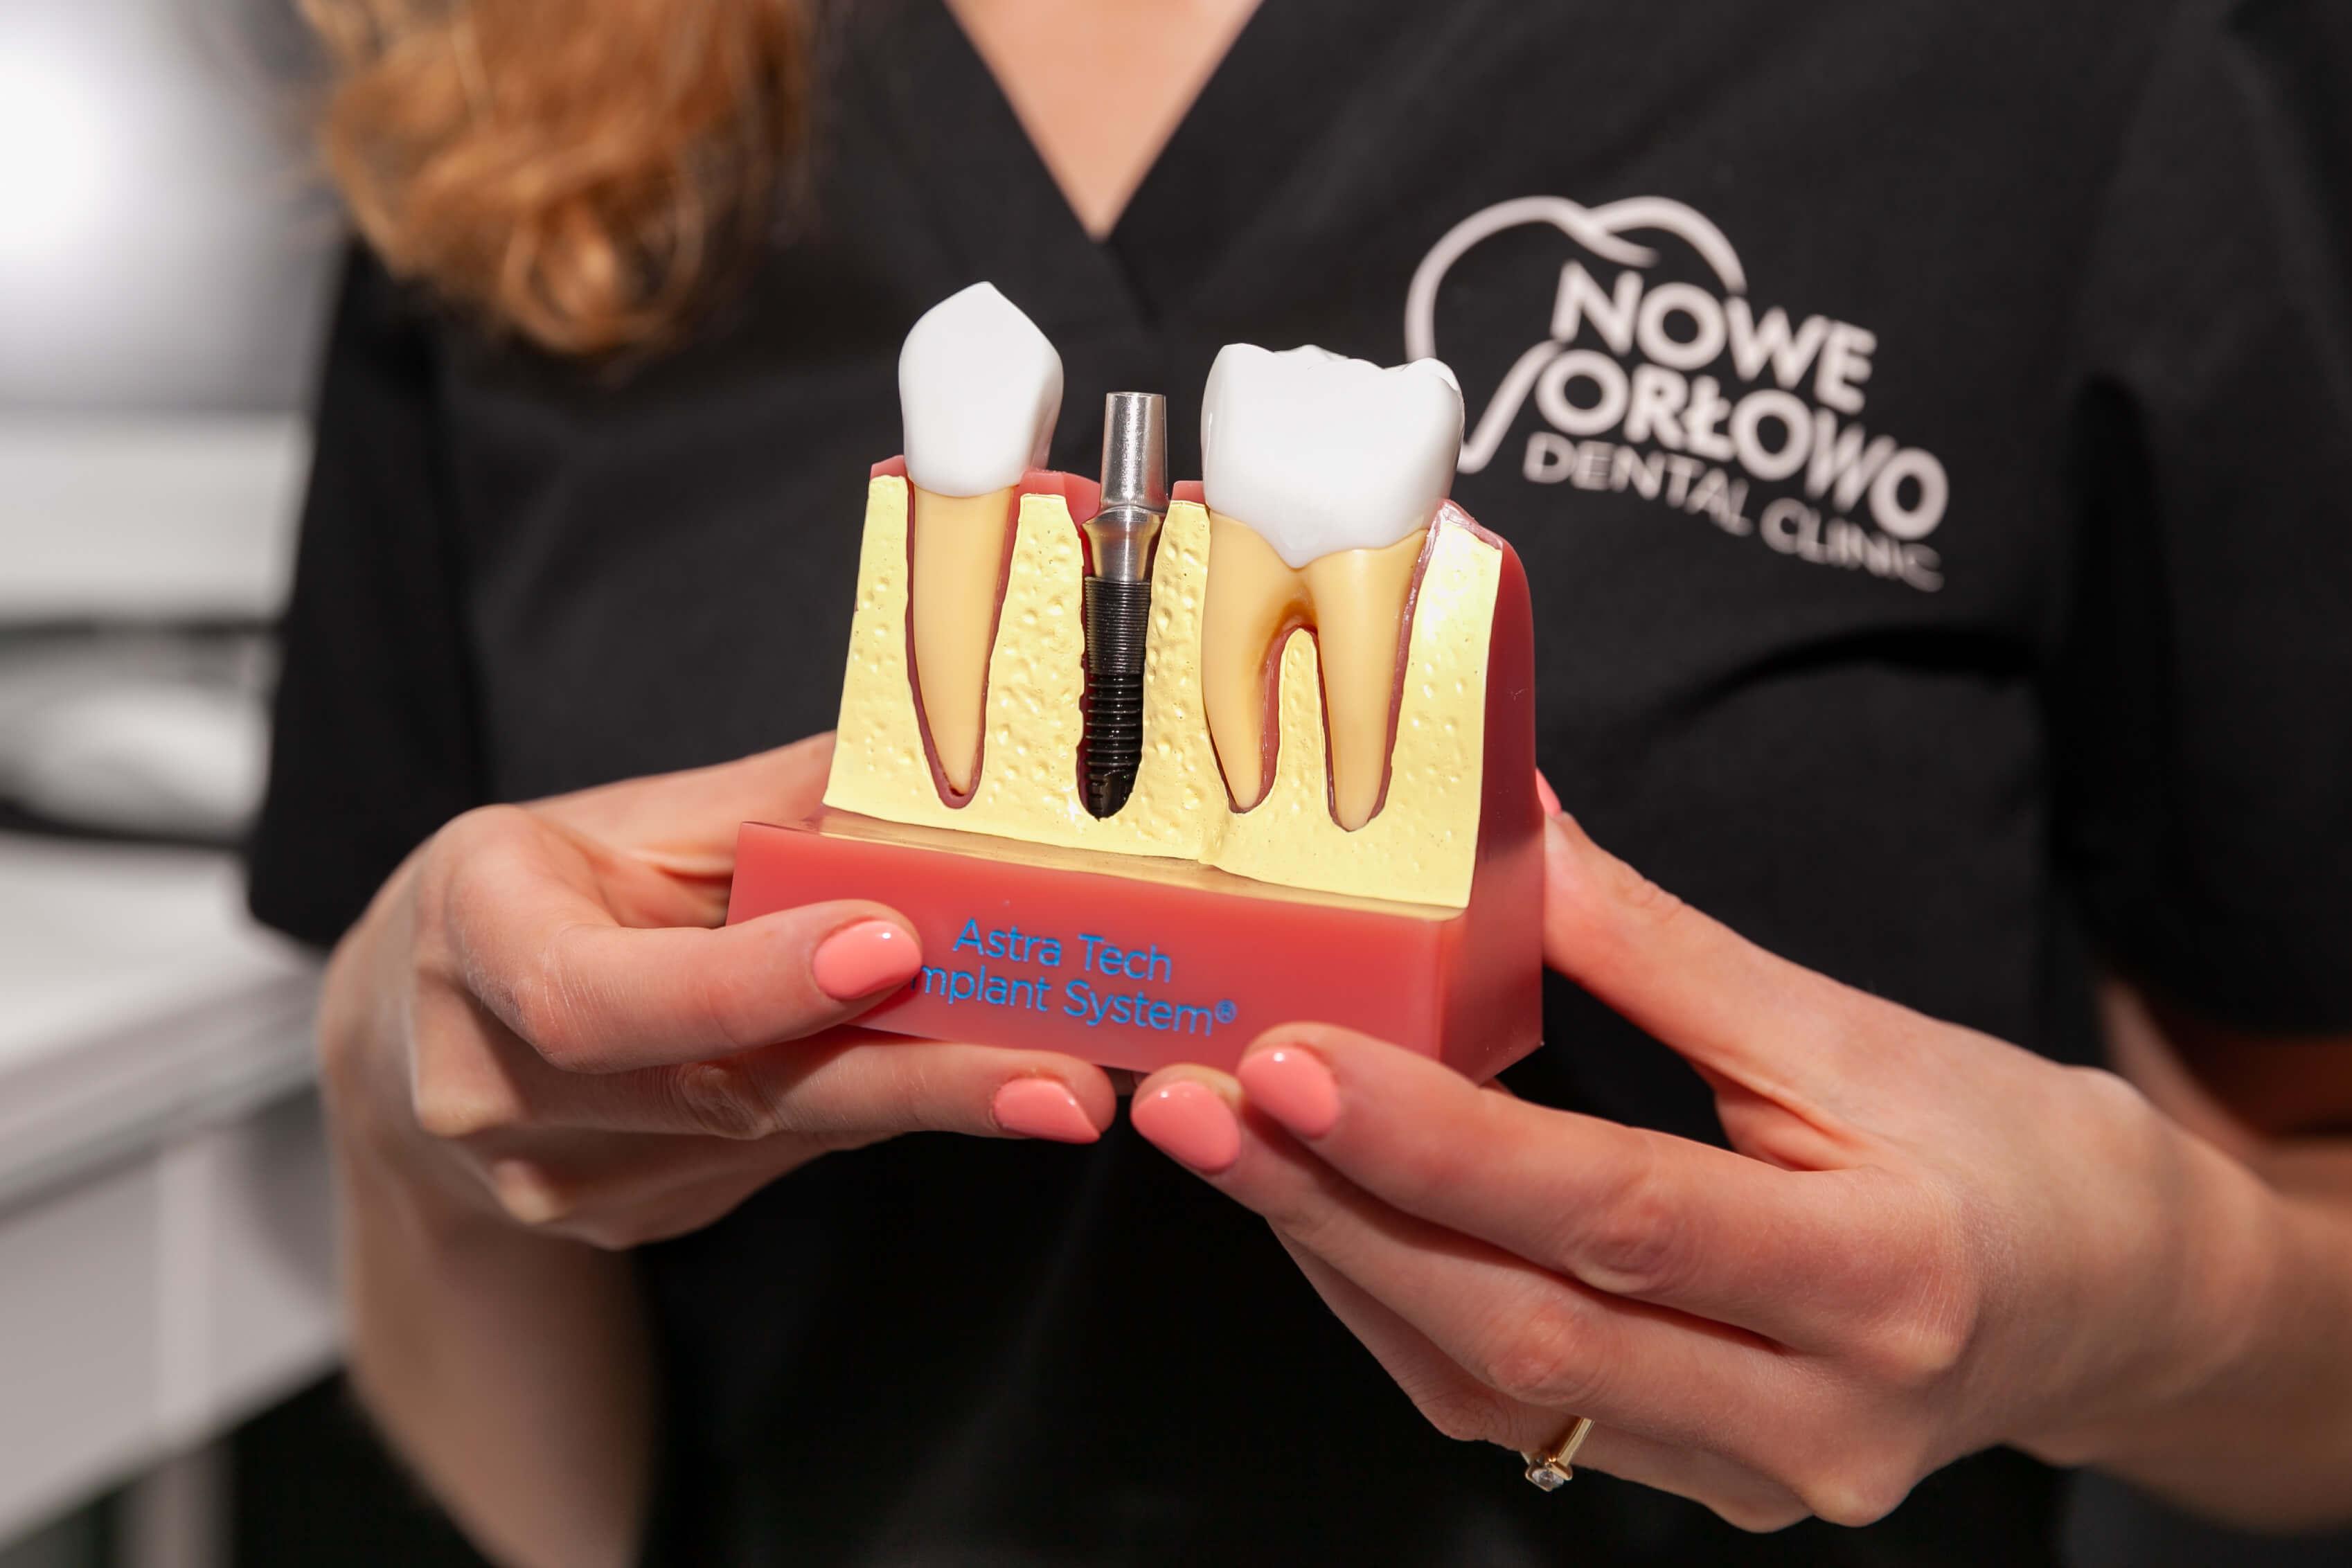 Nowe Orłowo Dental clinic 5 1 - Nowe Orłowo Dental Clinic - a clinic you can trust